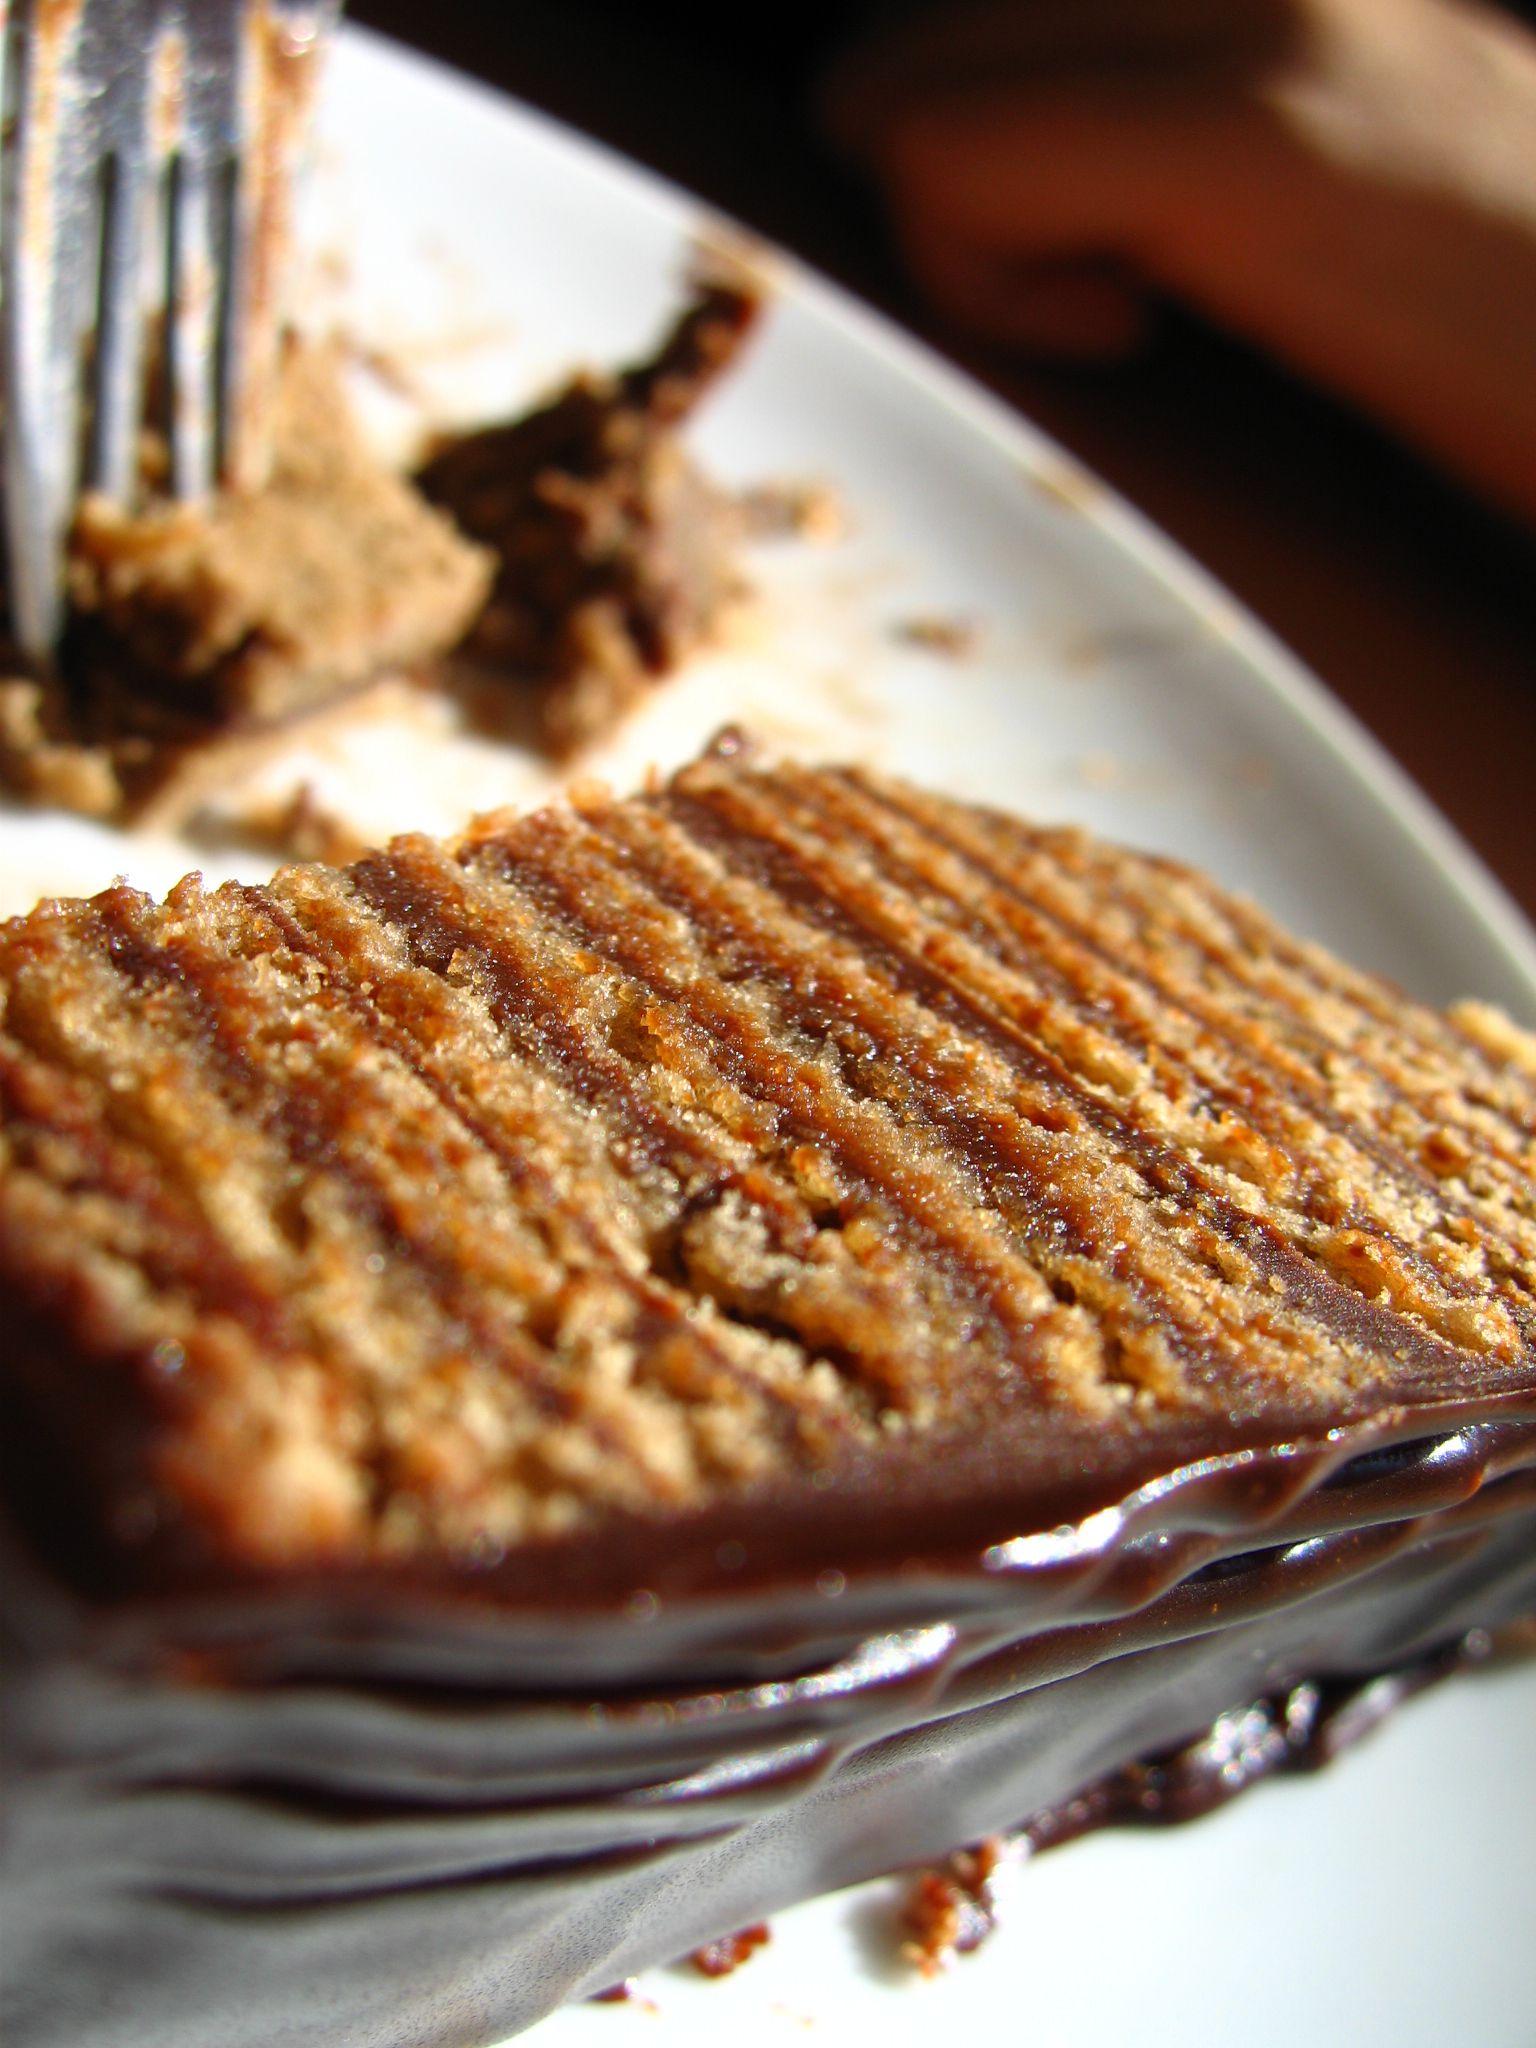 Serbian Multi-Layered Chocolate Cream Cake